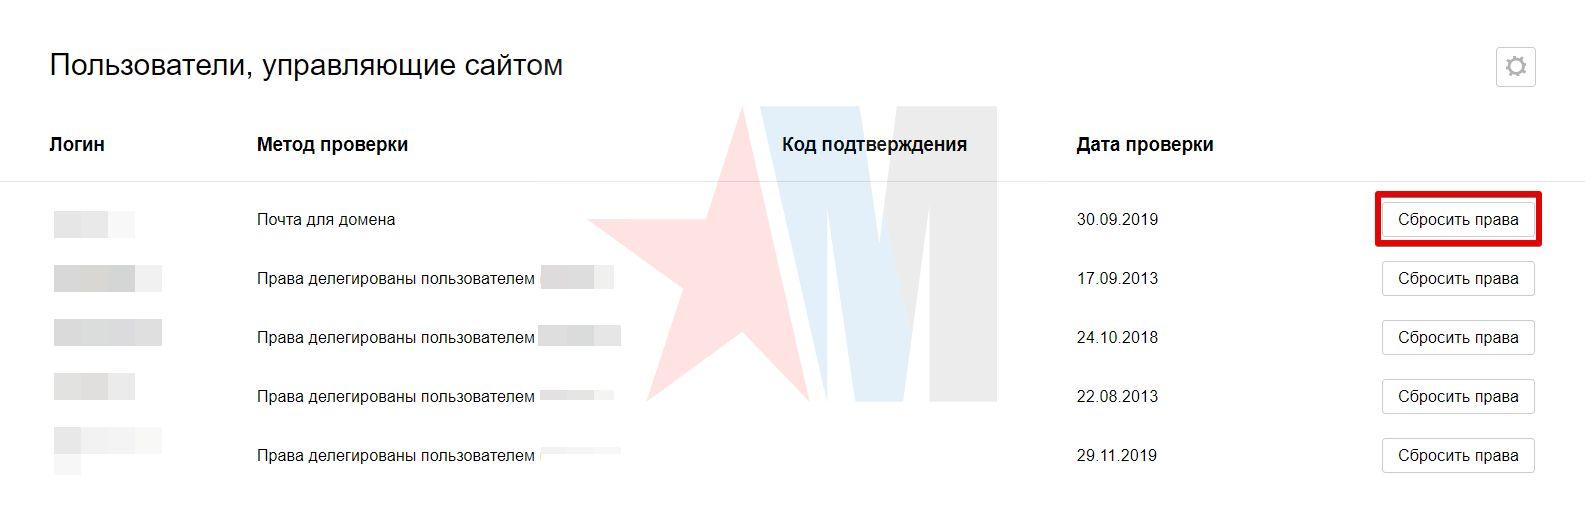 Права доступа — www.kormed.ru — Яндекс.Вебмастер -1